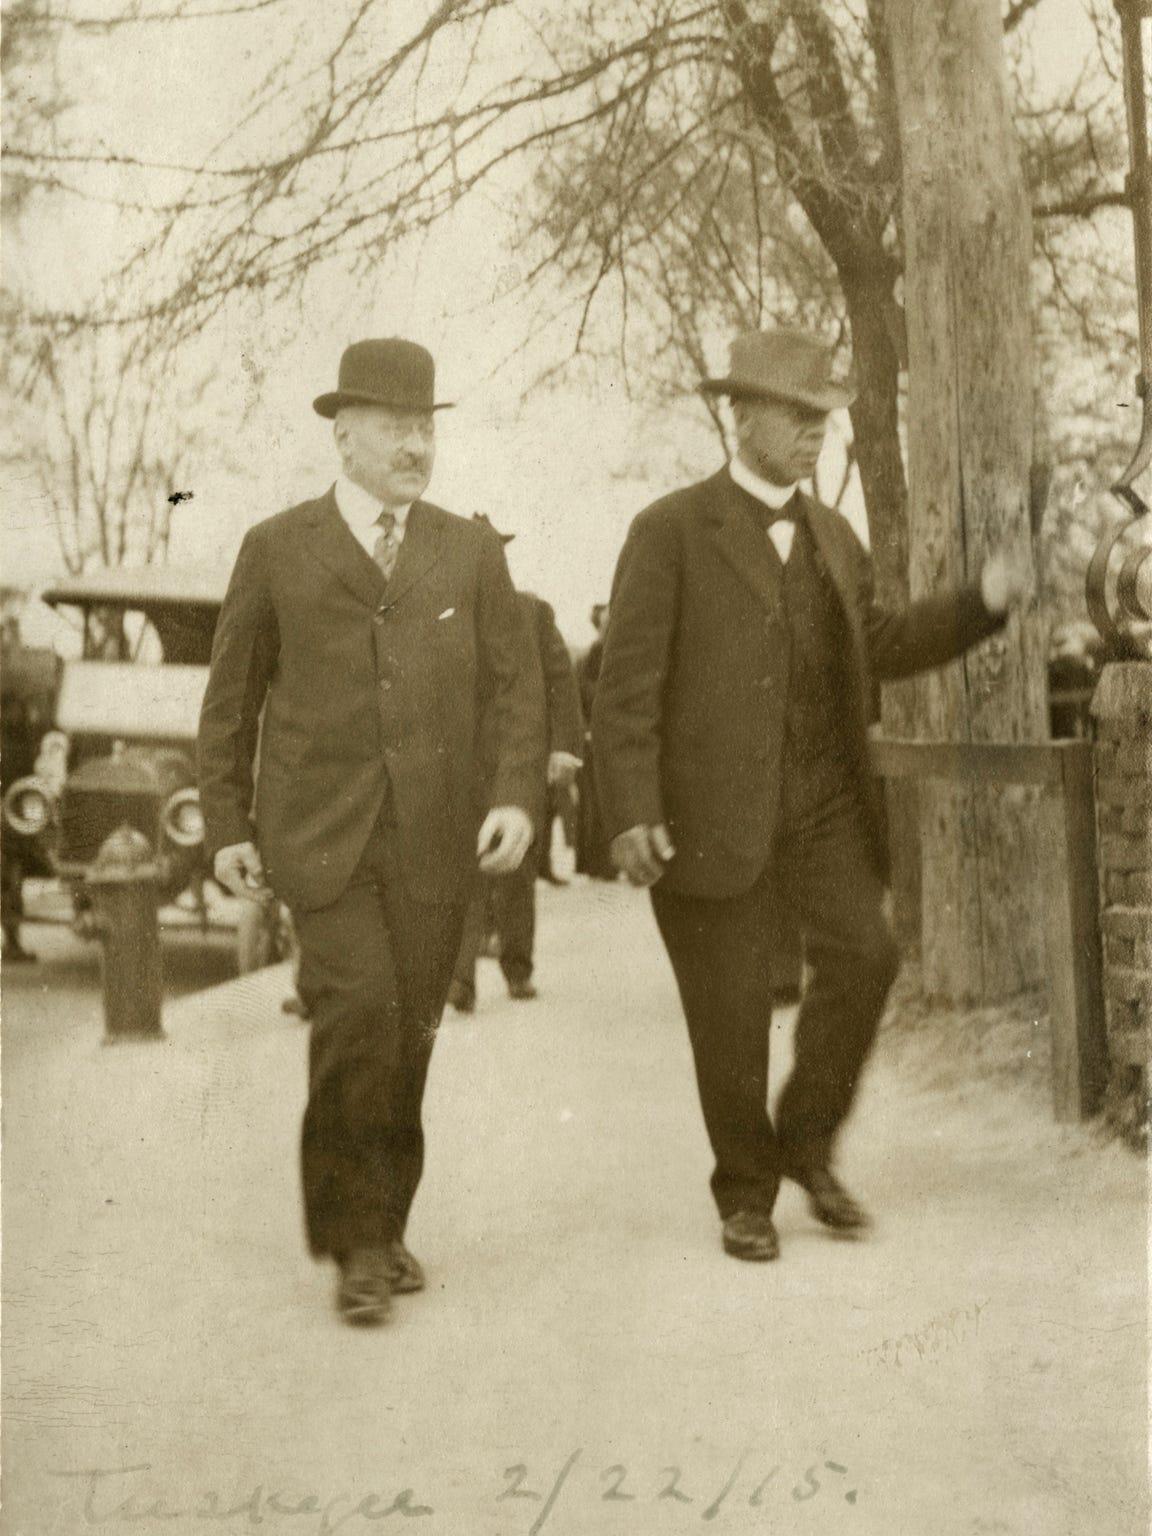 Julius Rosenwald and Booker T. Washington, Tuskegee